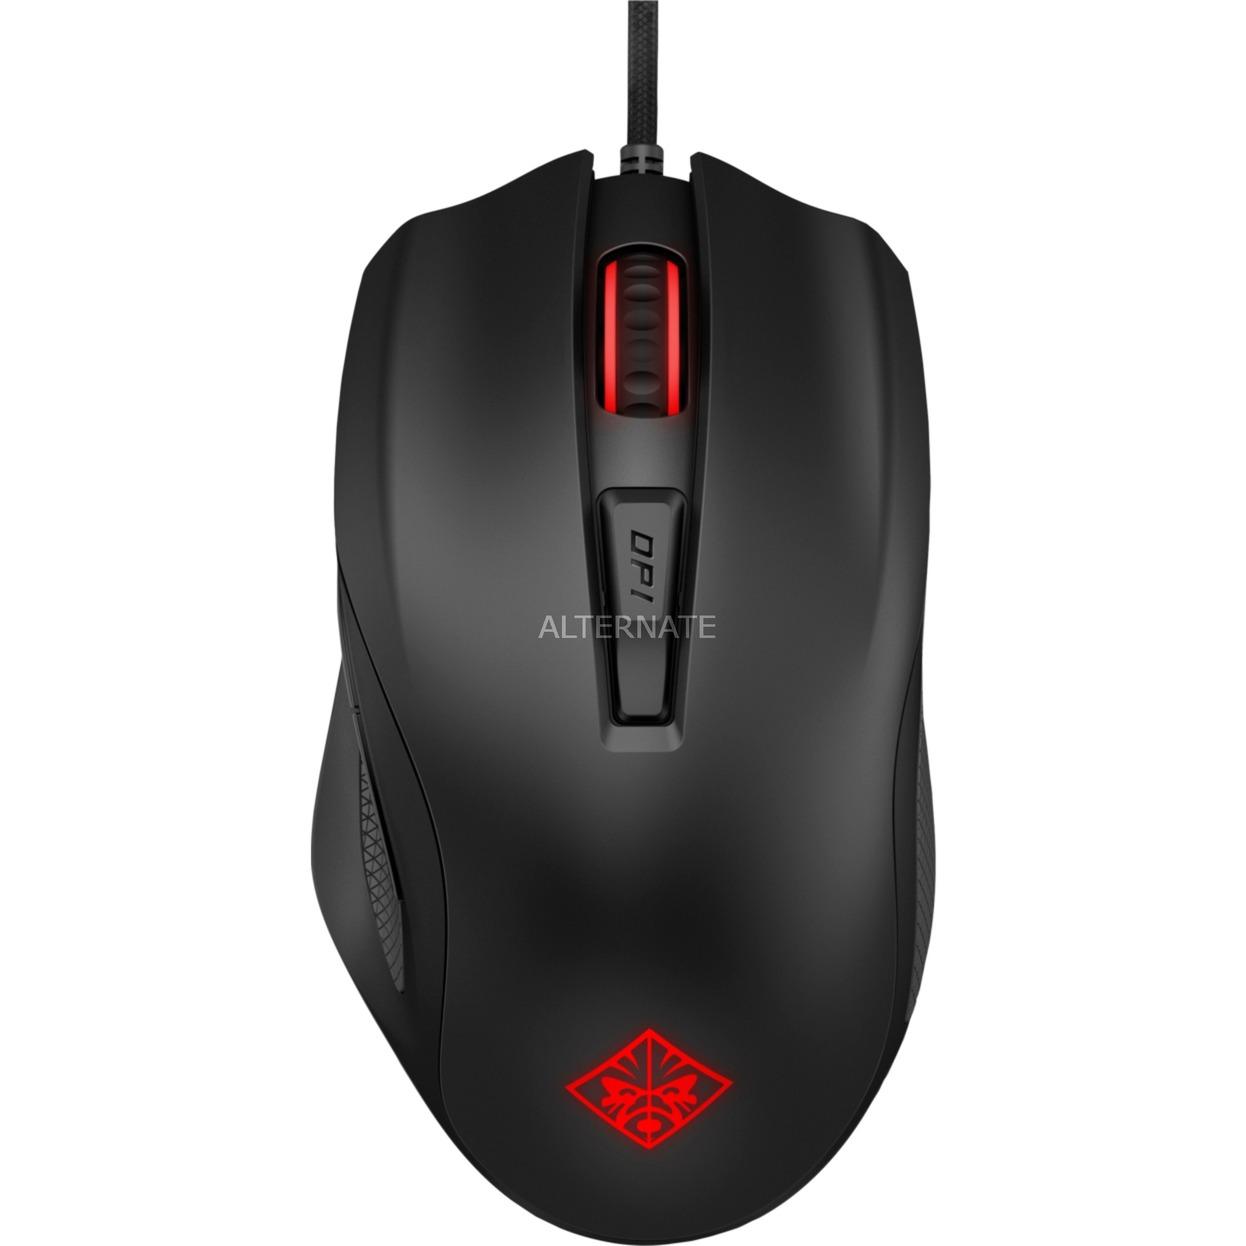 OMEN 600 ratón USB Óptico 12000 DPI mano derecha